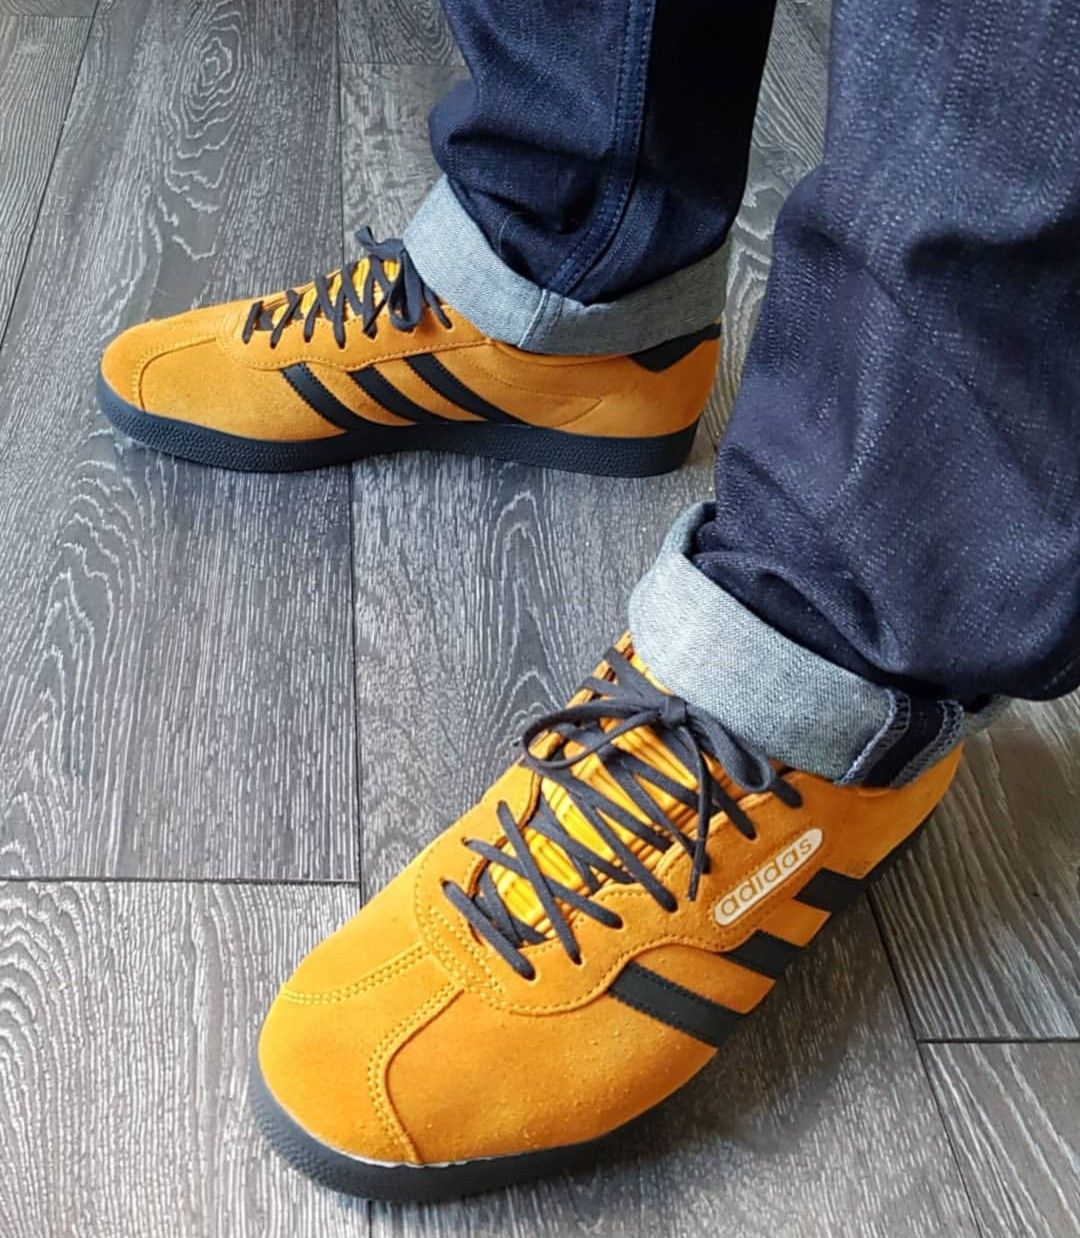 ab13973c0a8c Gazelle Supers on feet on the street Adidas Og